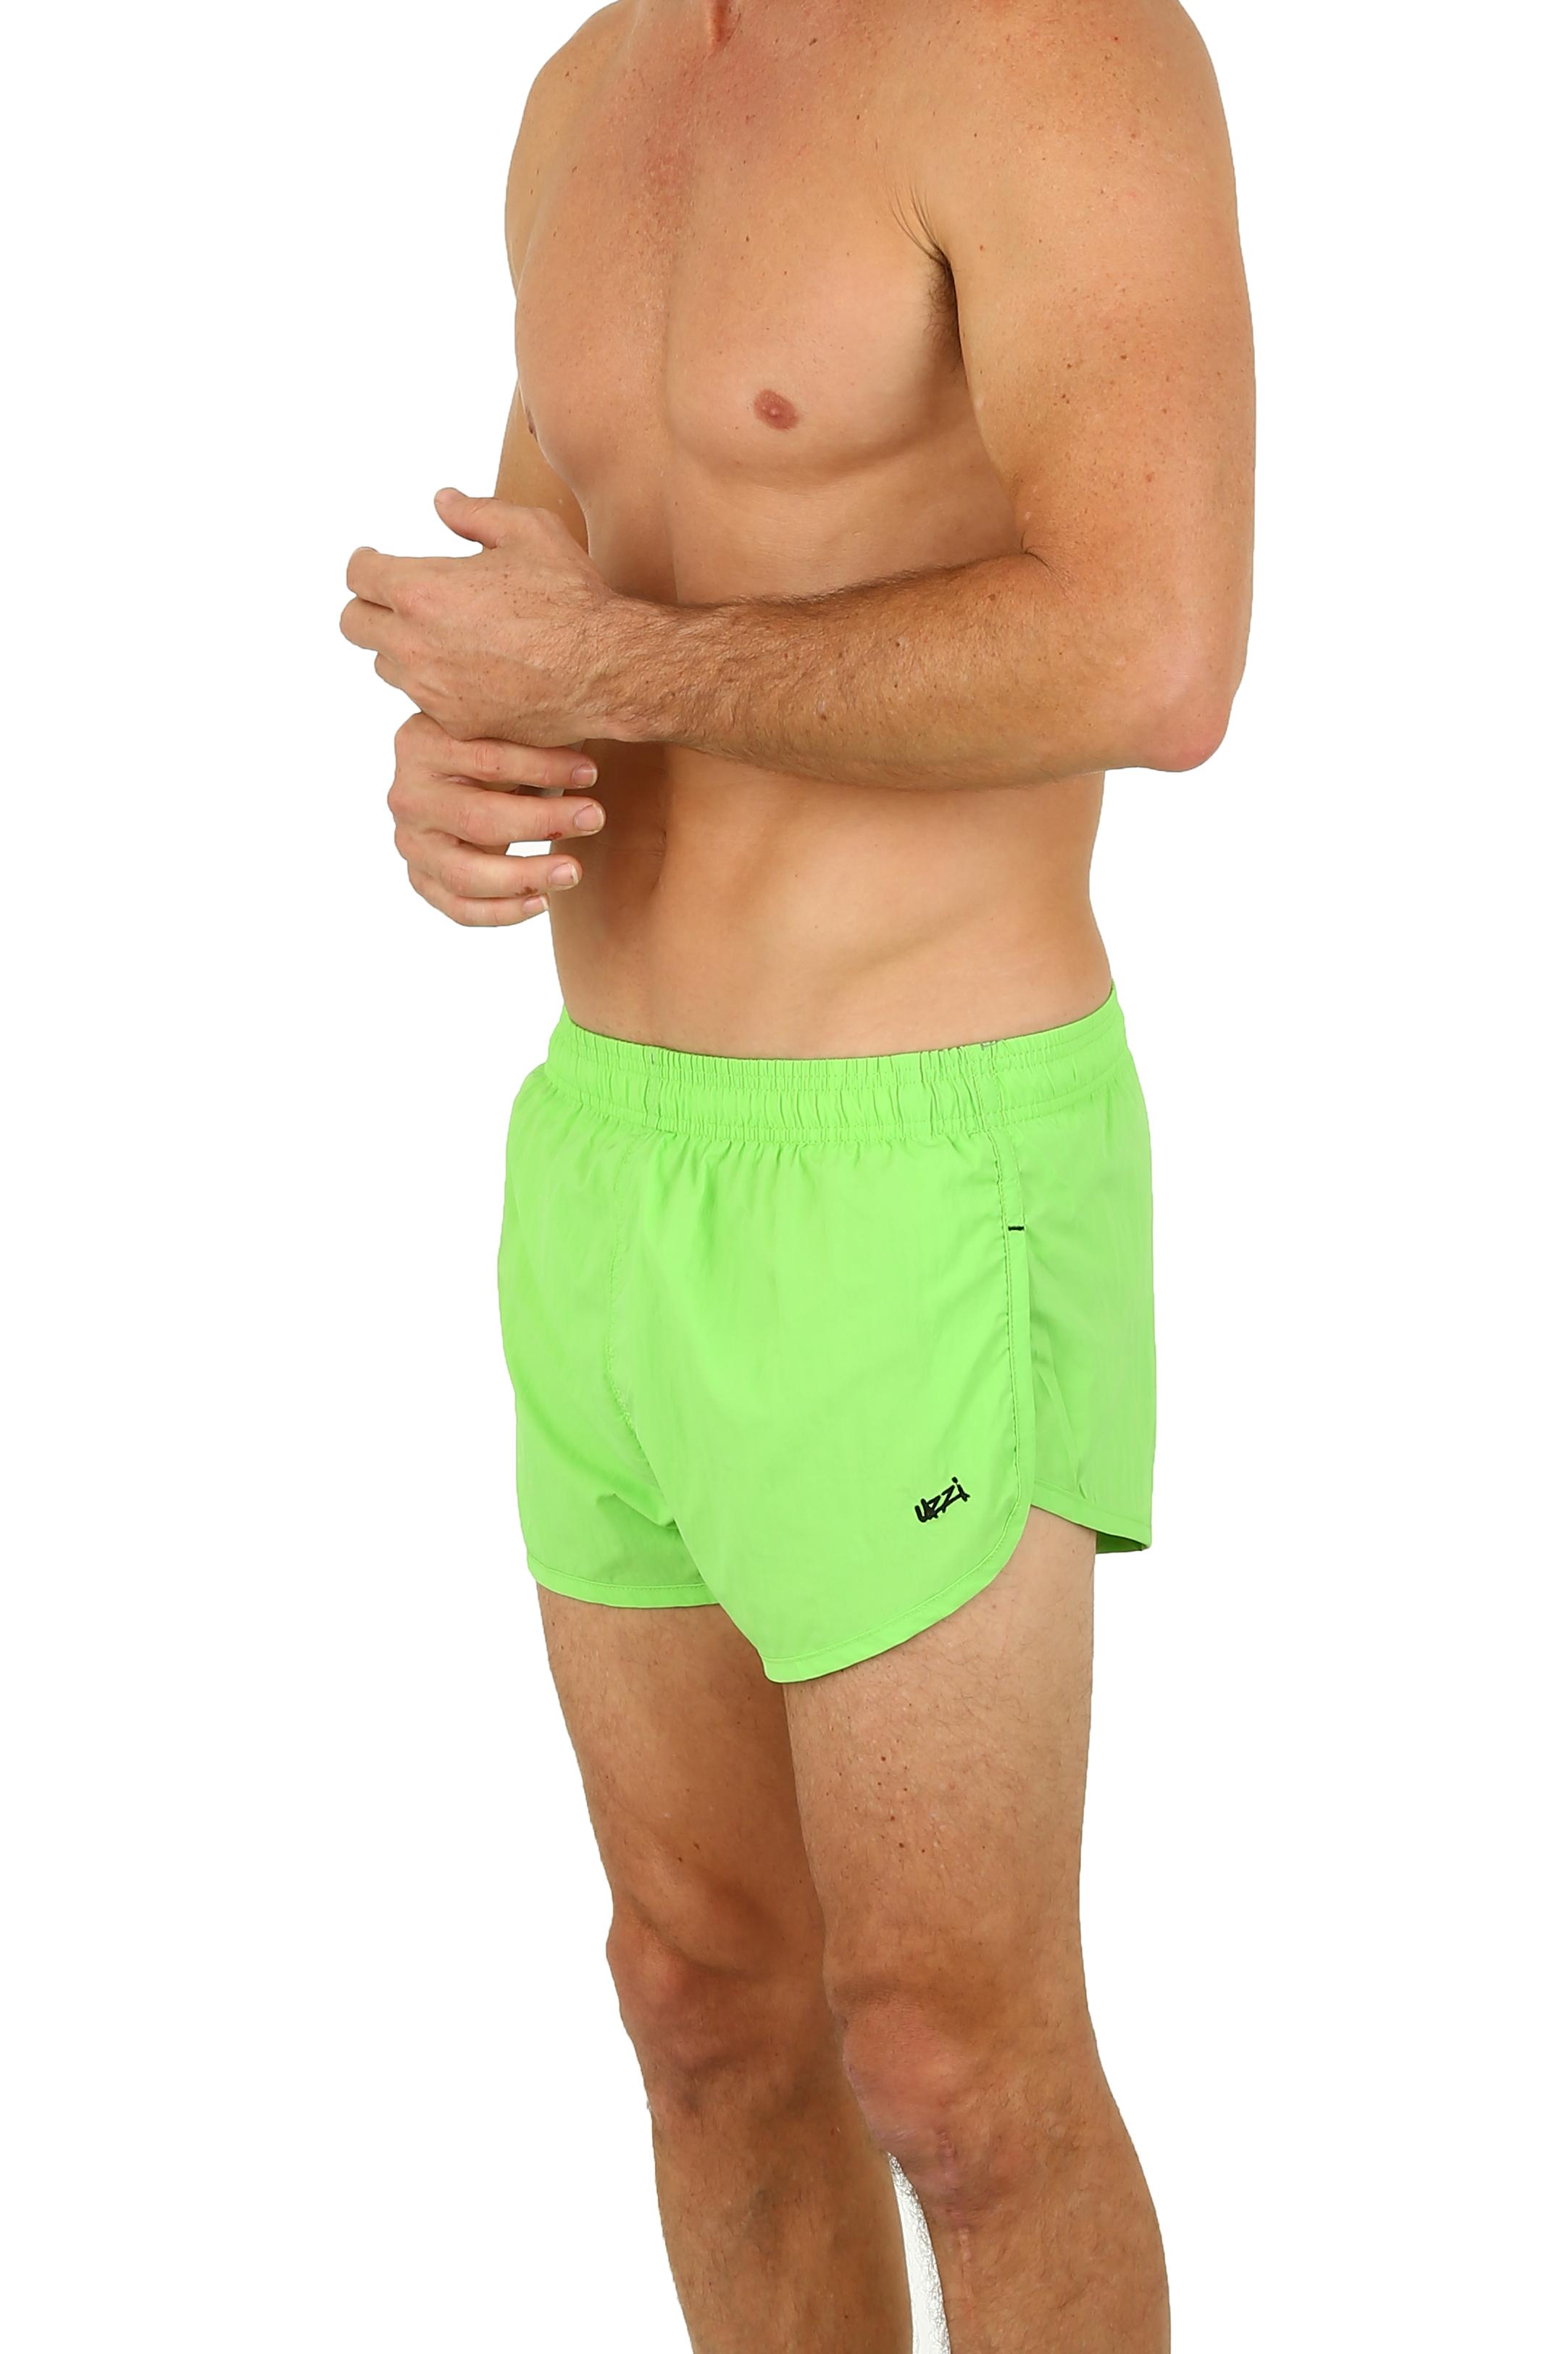 a0b7d3e638 Uzzi Men's Basic Running Shorts Swimwear Trunks Waterproof ...